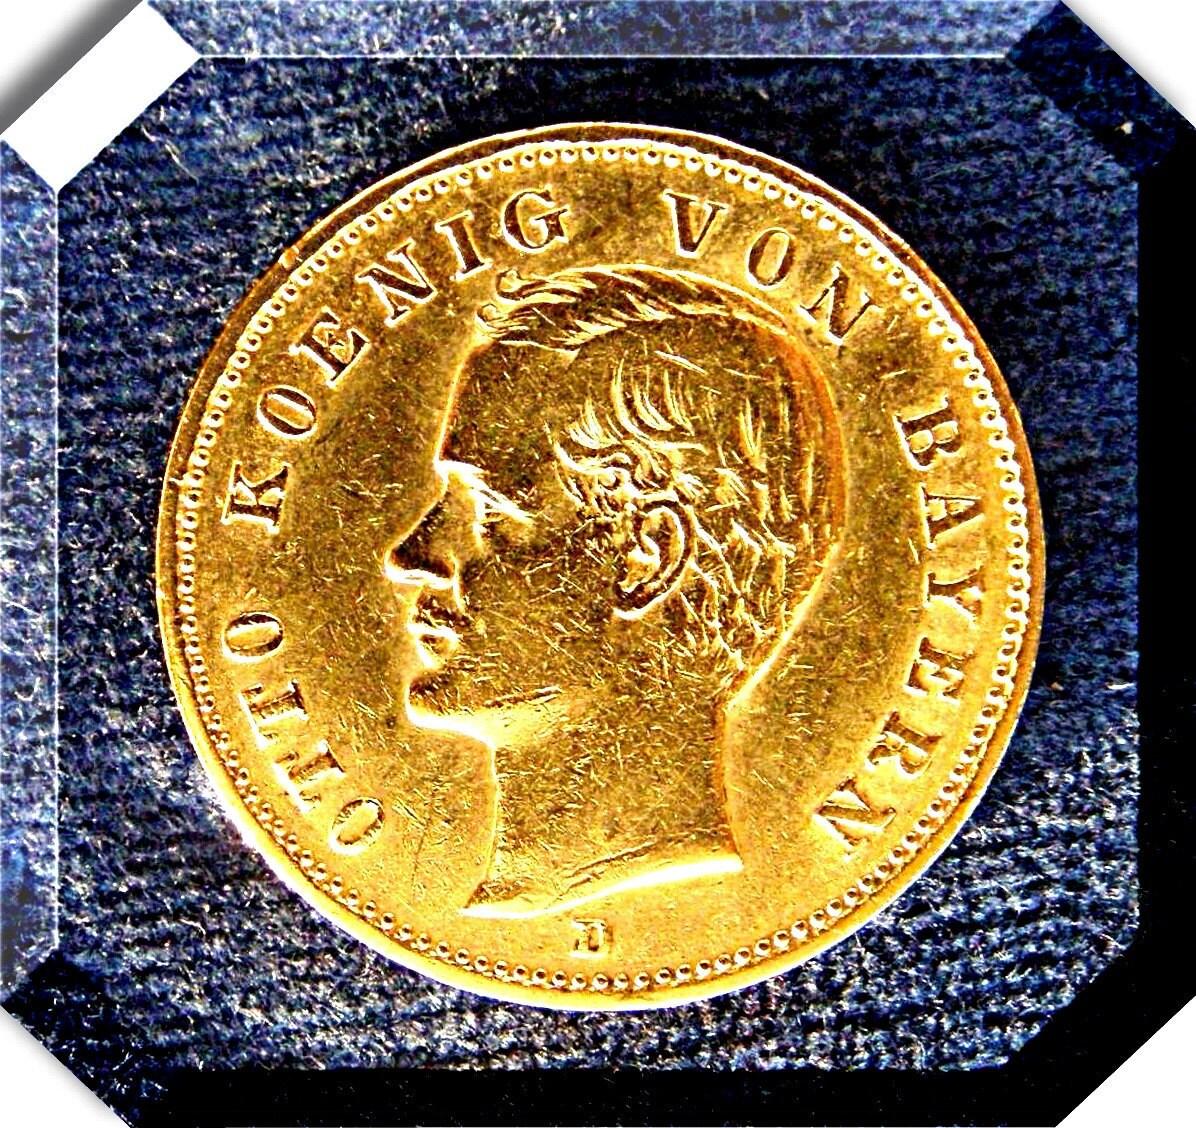 gold mark 20 dm gold coin germany king otto of bavaria 1900. Black Bedroom Furniture Sets. Home Design Ideas